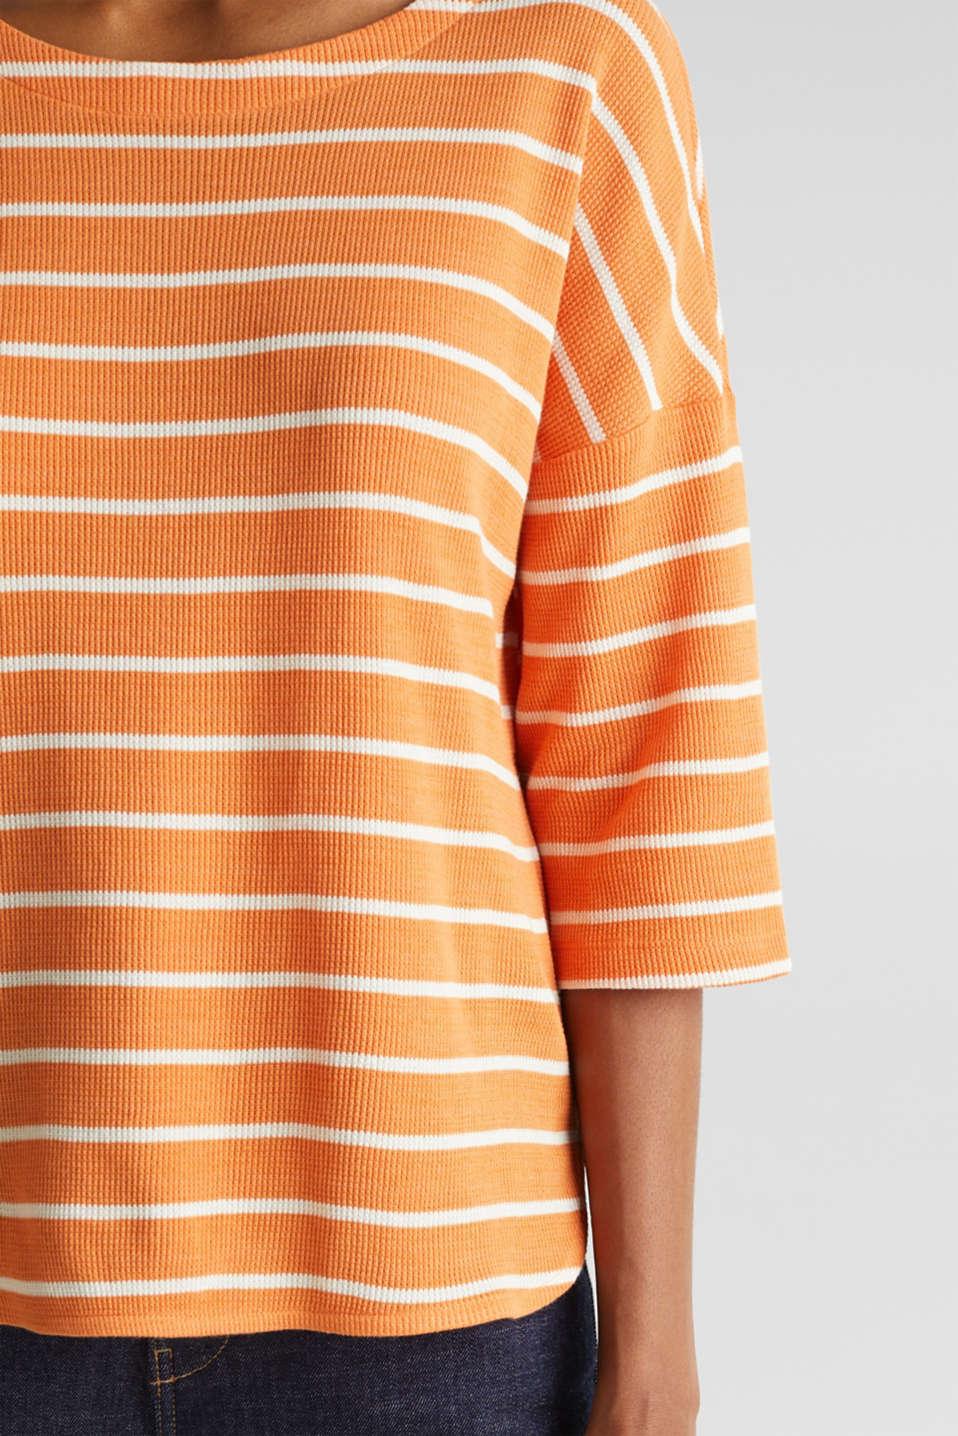 Piqué T-shirt in 100% cotton, RUST ORANGE, detail image number 2